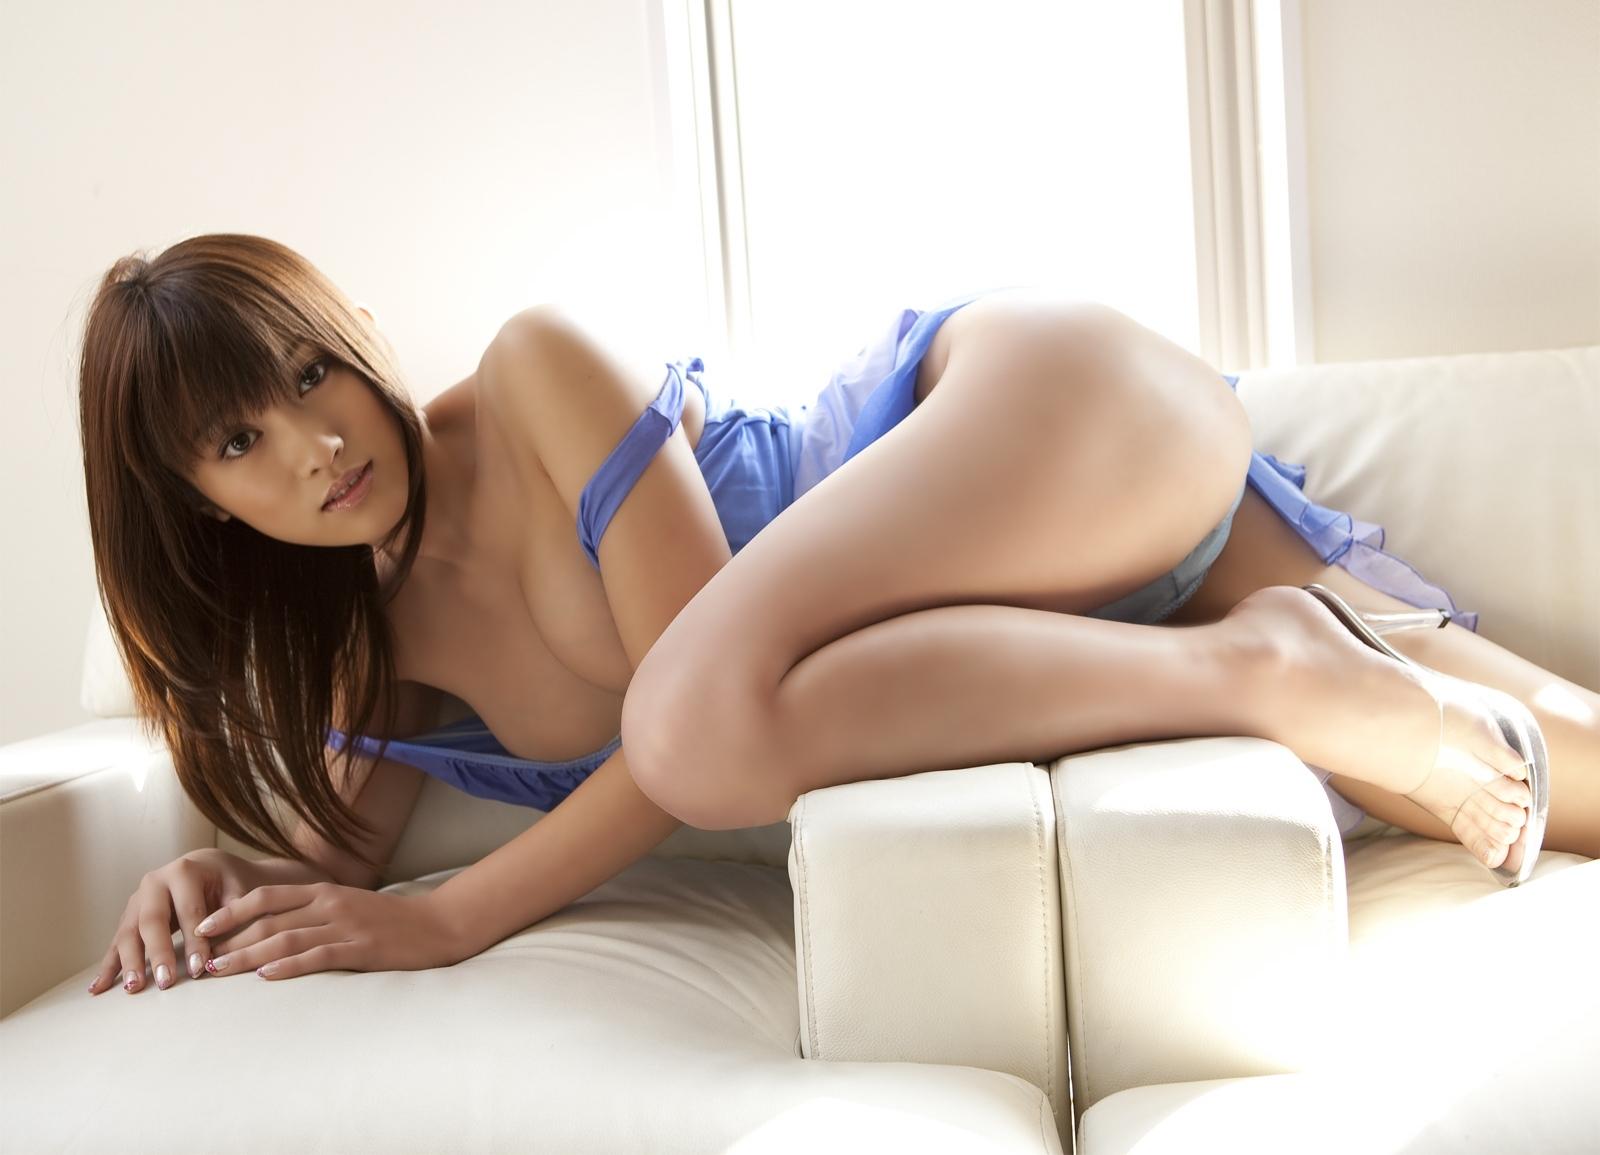 Hot Japanese Girls Boobs